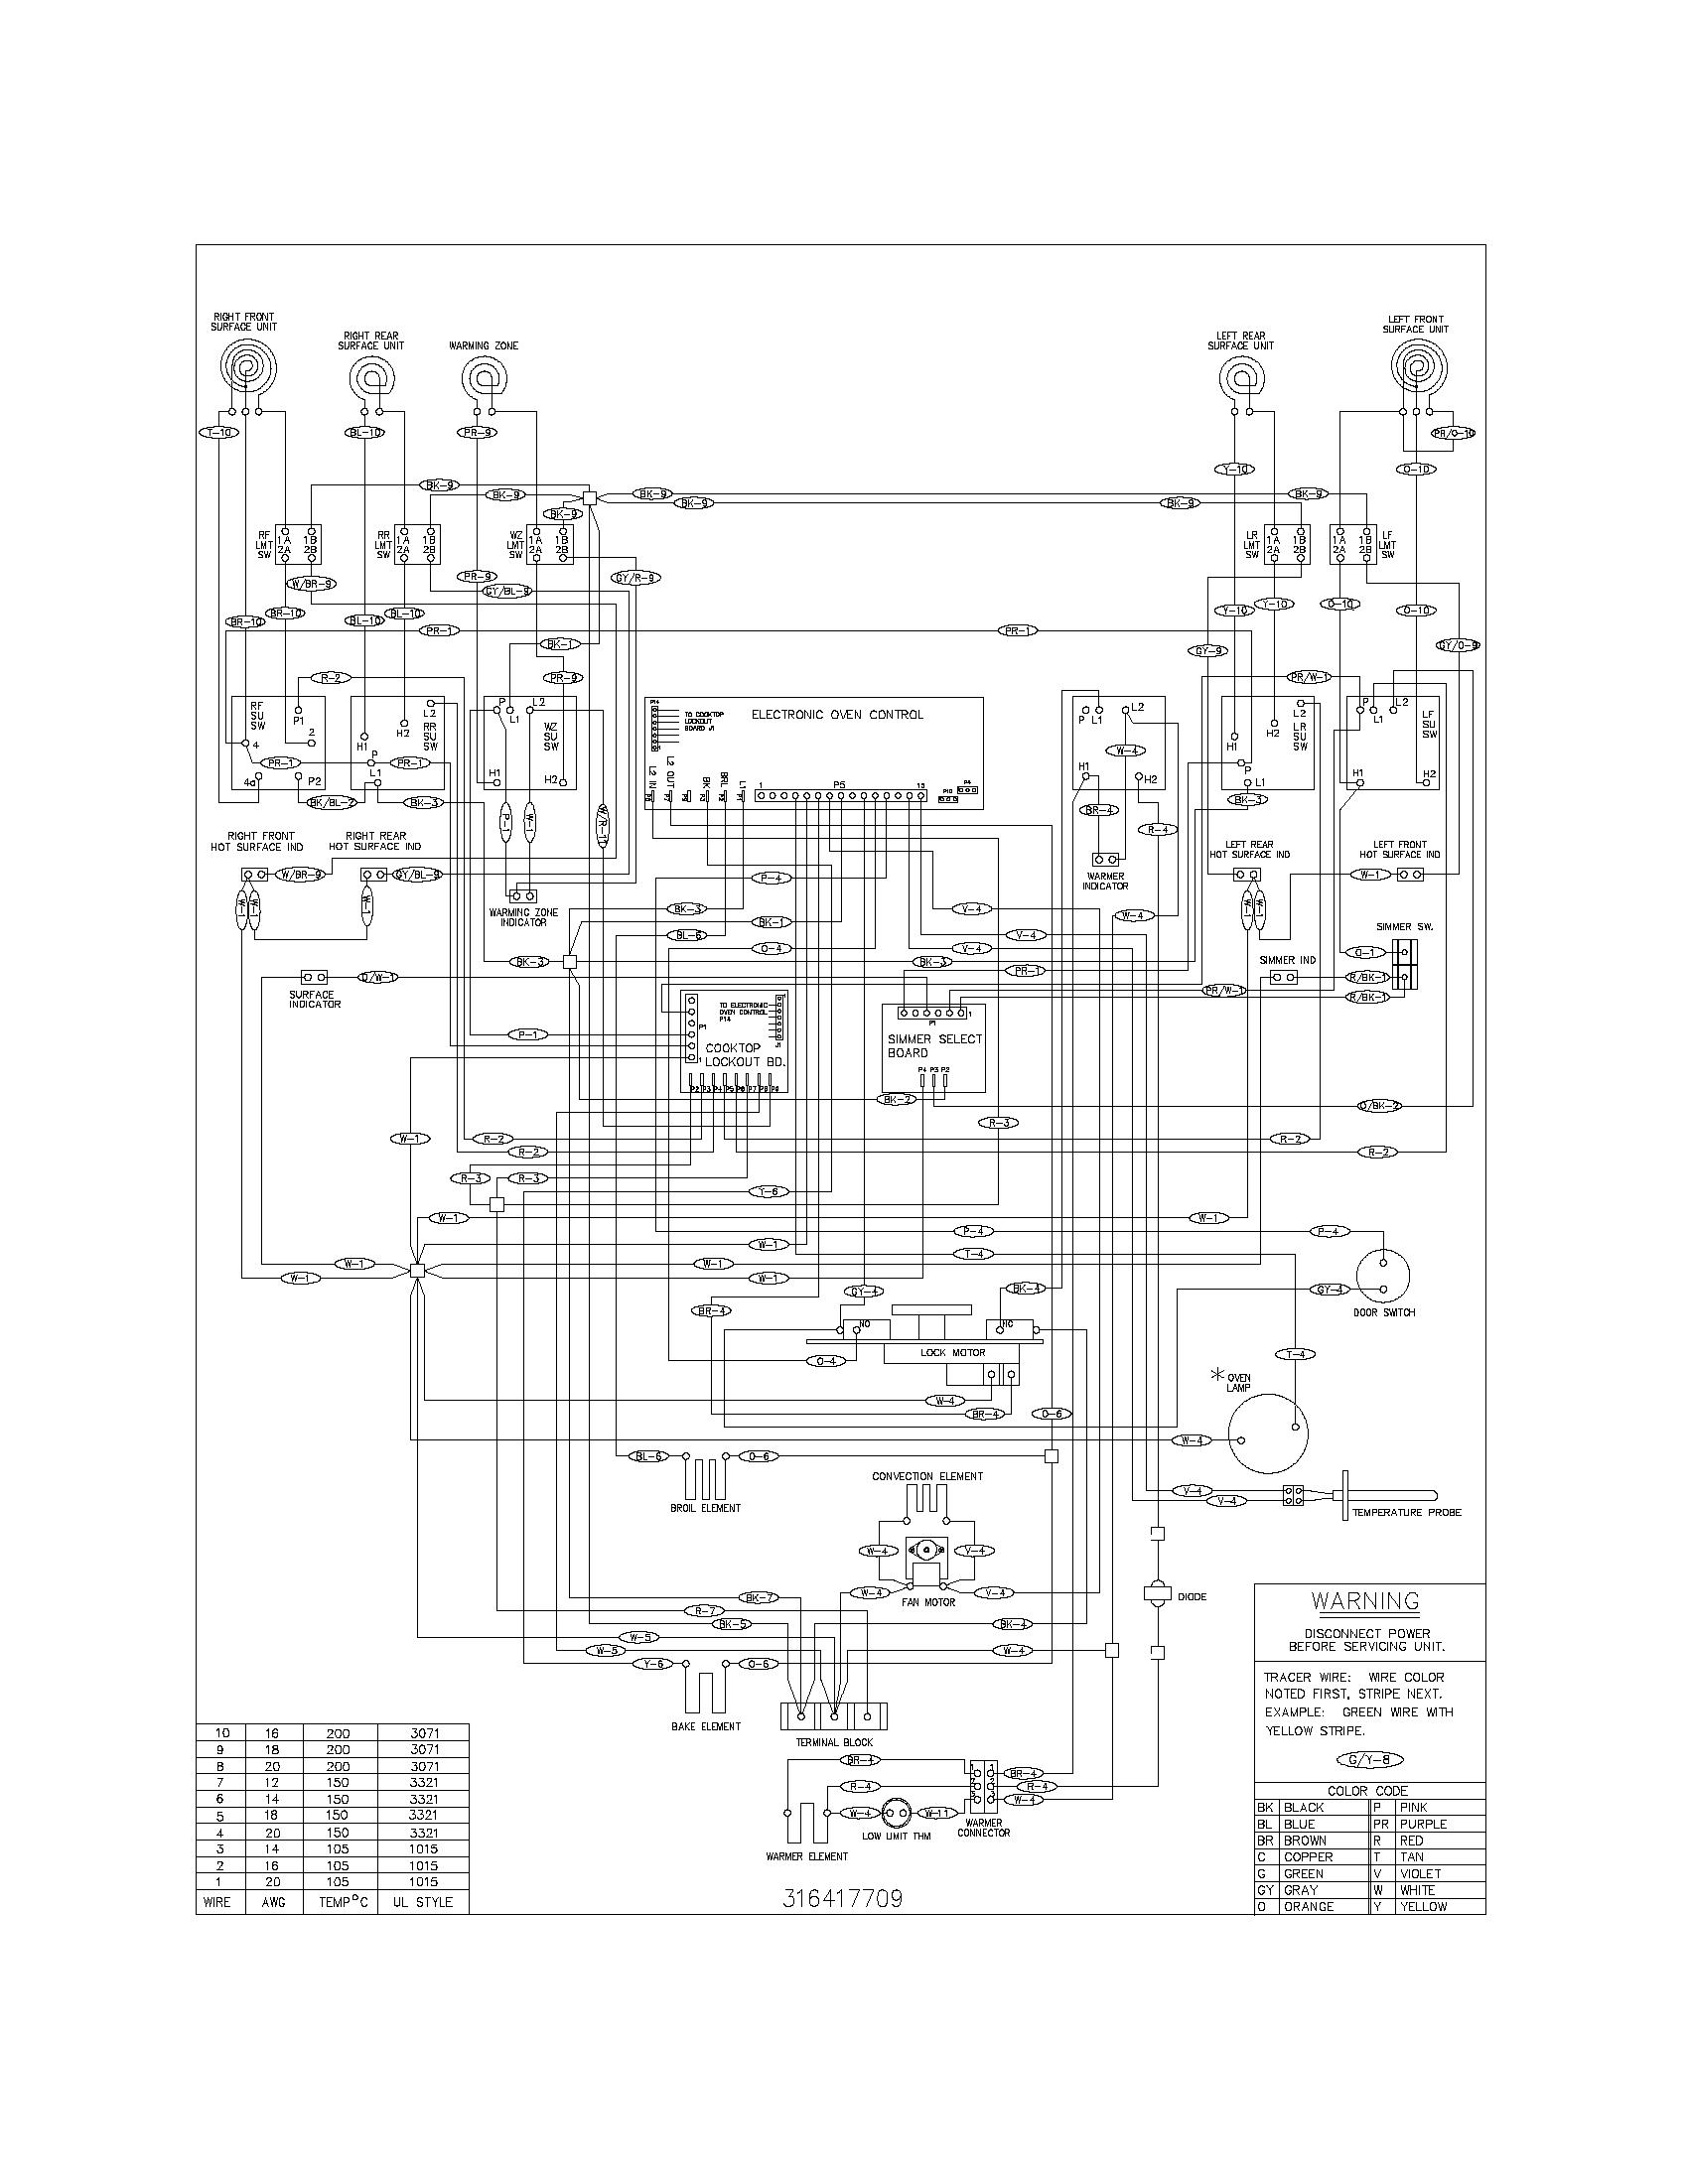 Kenmore Elite Refrigerator Wiring Diagram on